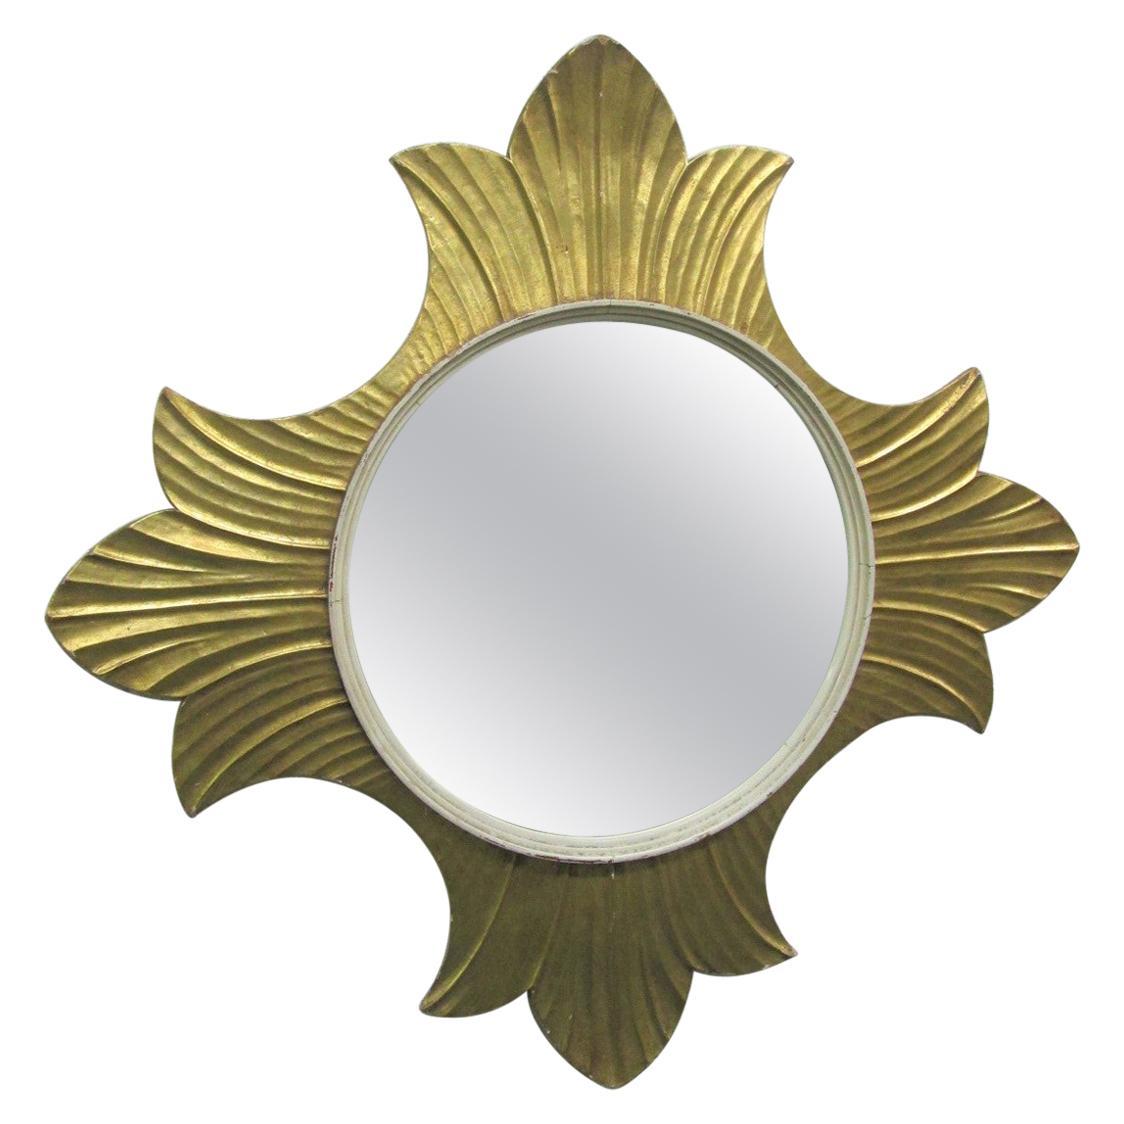 Decorative Gold Leaf Mirror